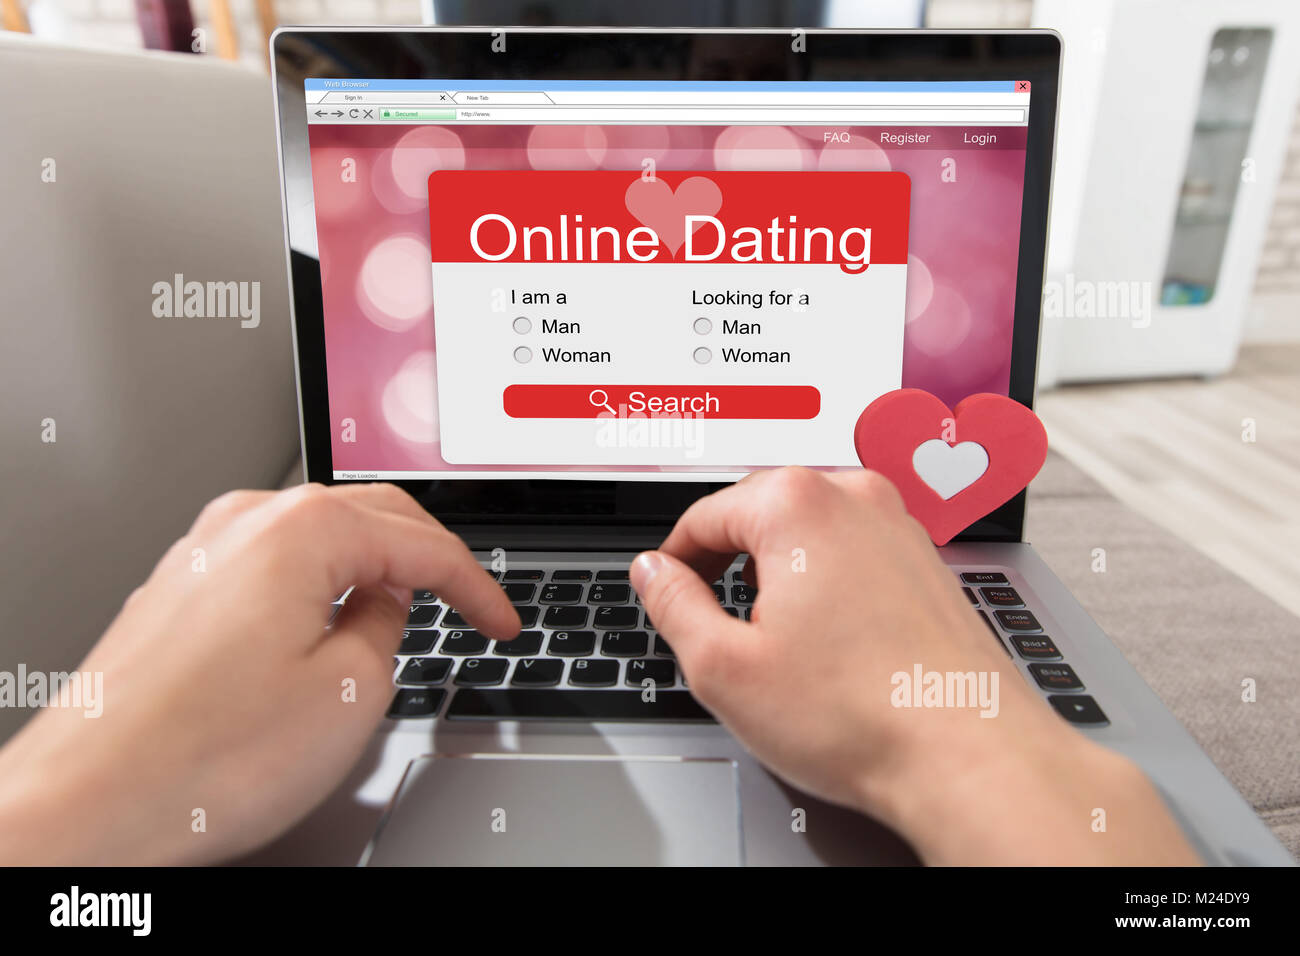 faq Dating-Seiten